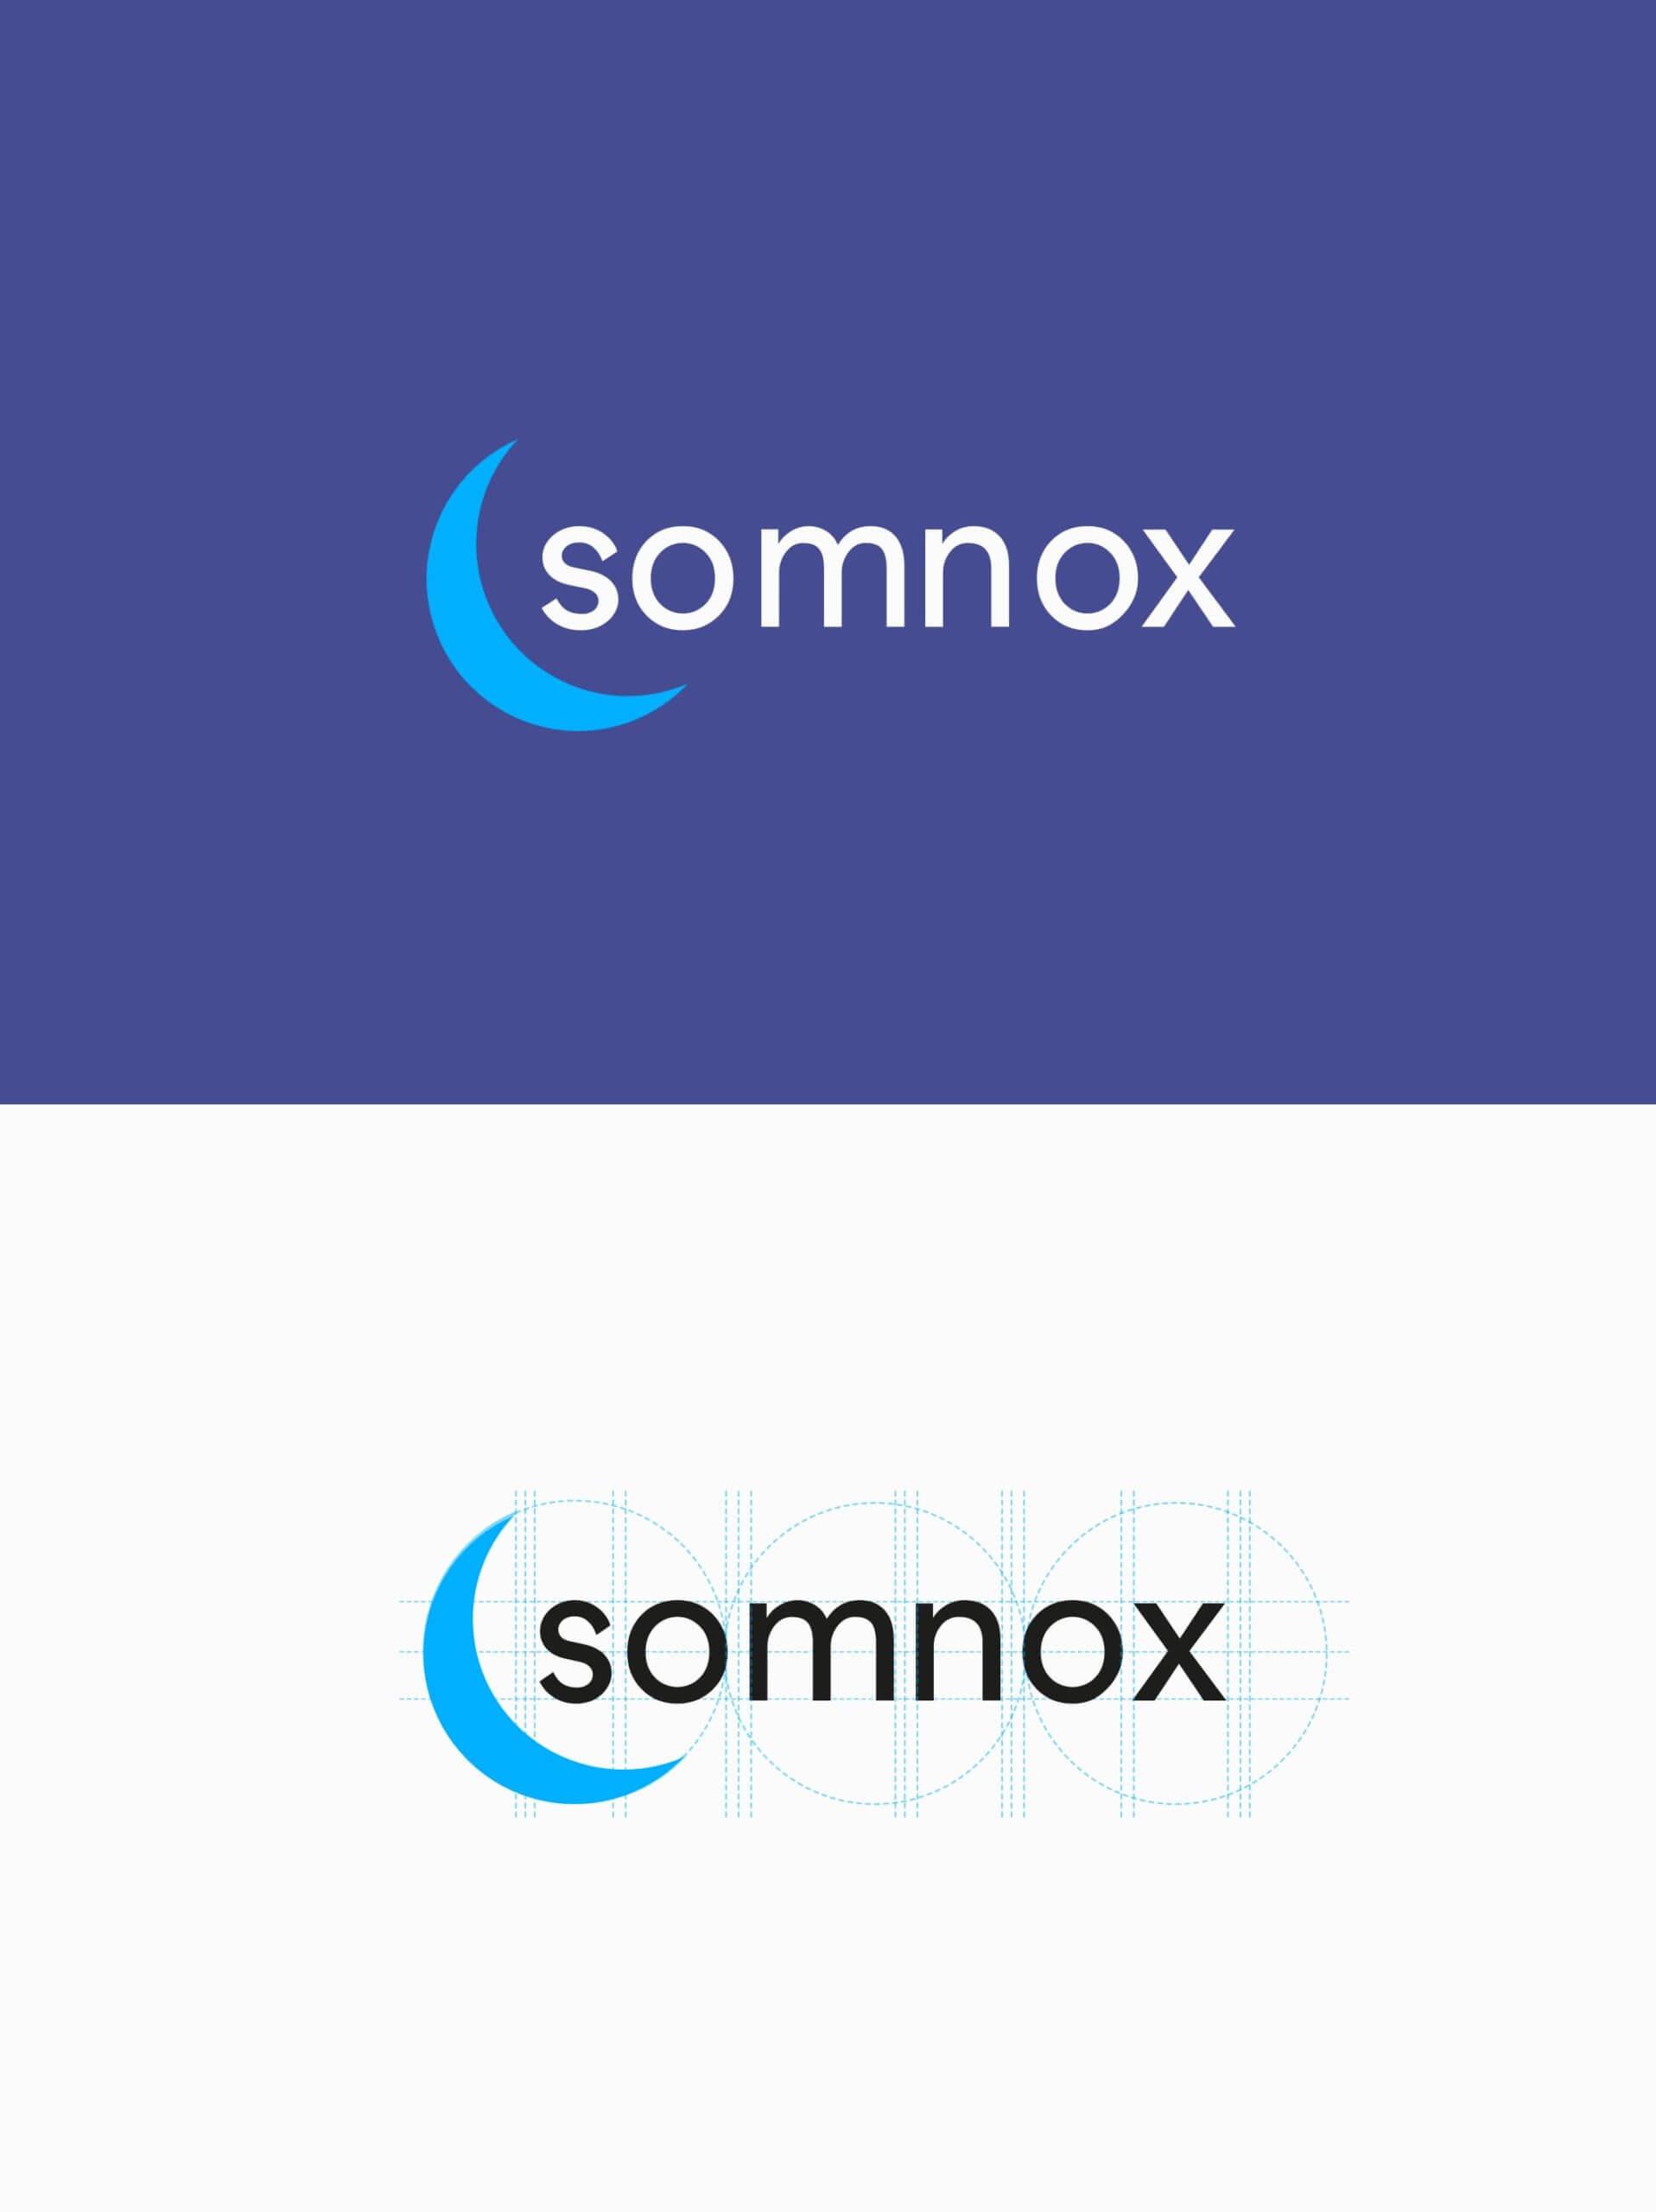 Somnox-01